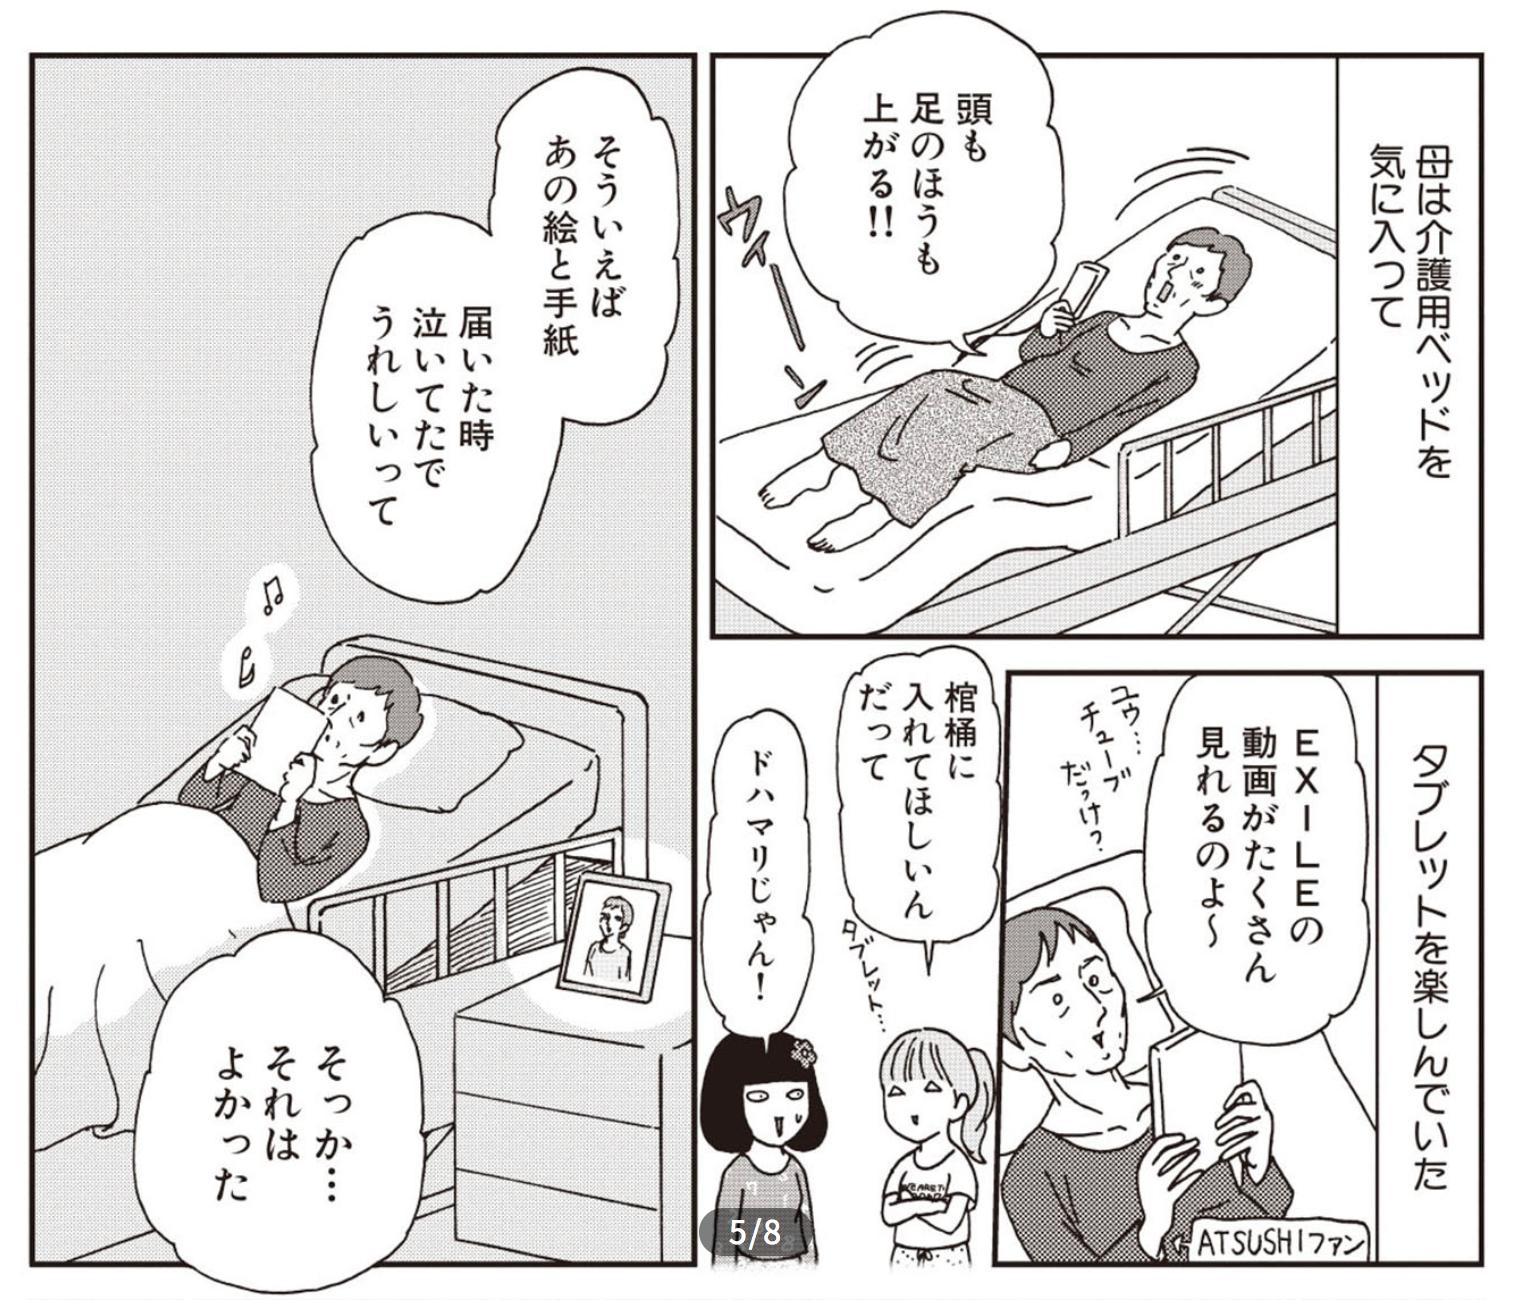 HospitalBed_Takenami.png